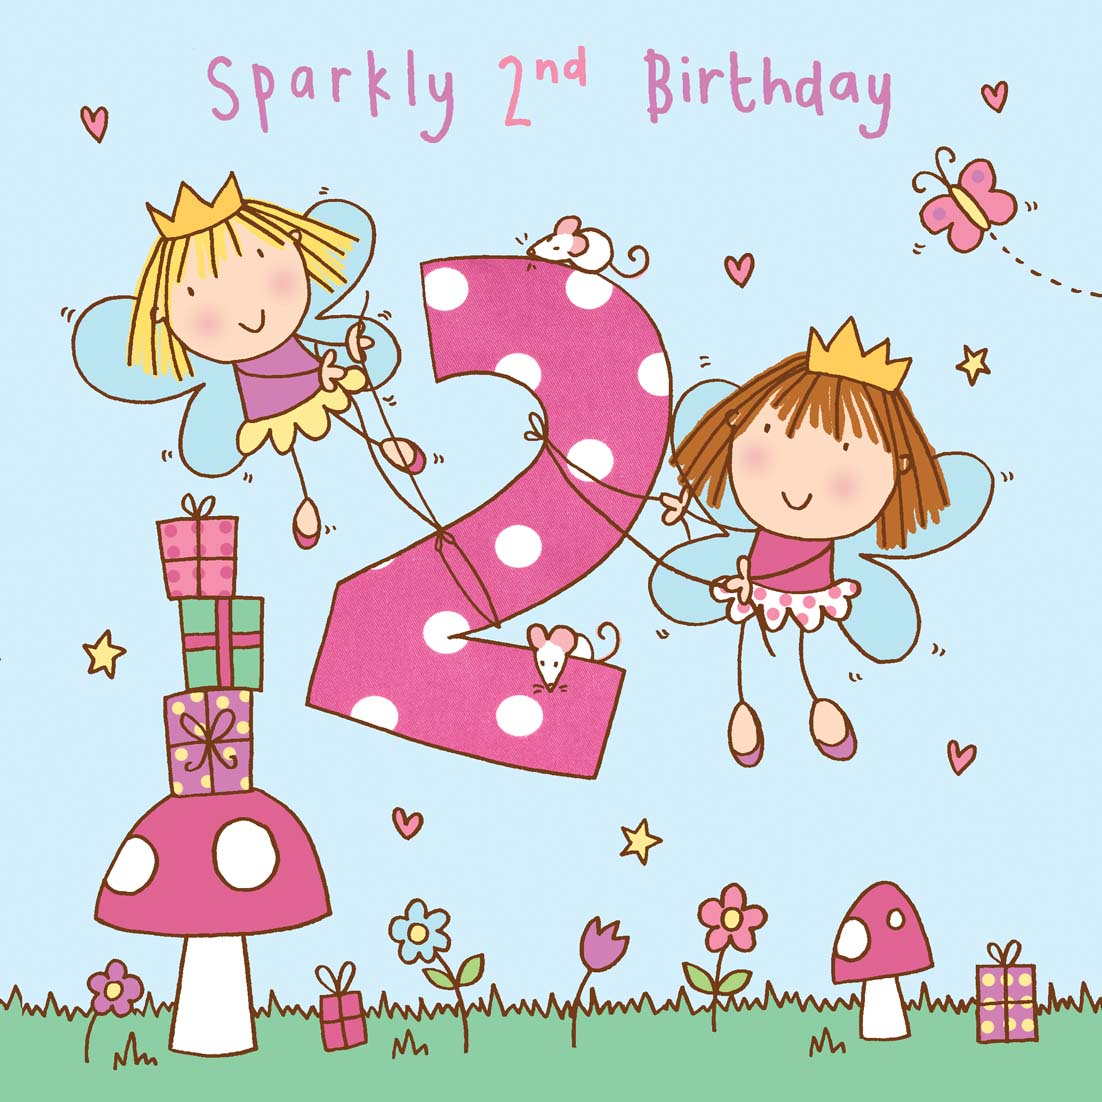 Age 2 Girls Twinkly Birthday Card Tw731 Childrens Birthday Cards